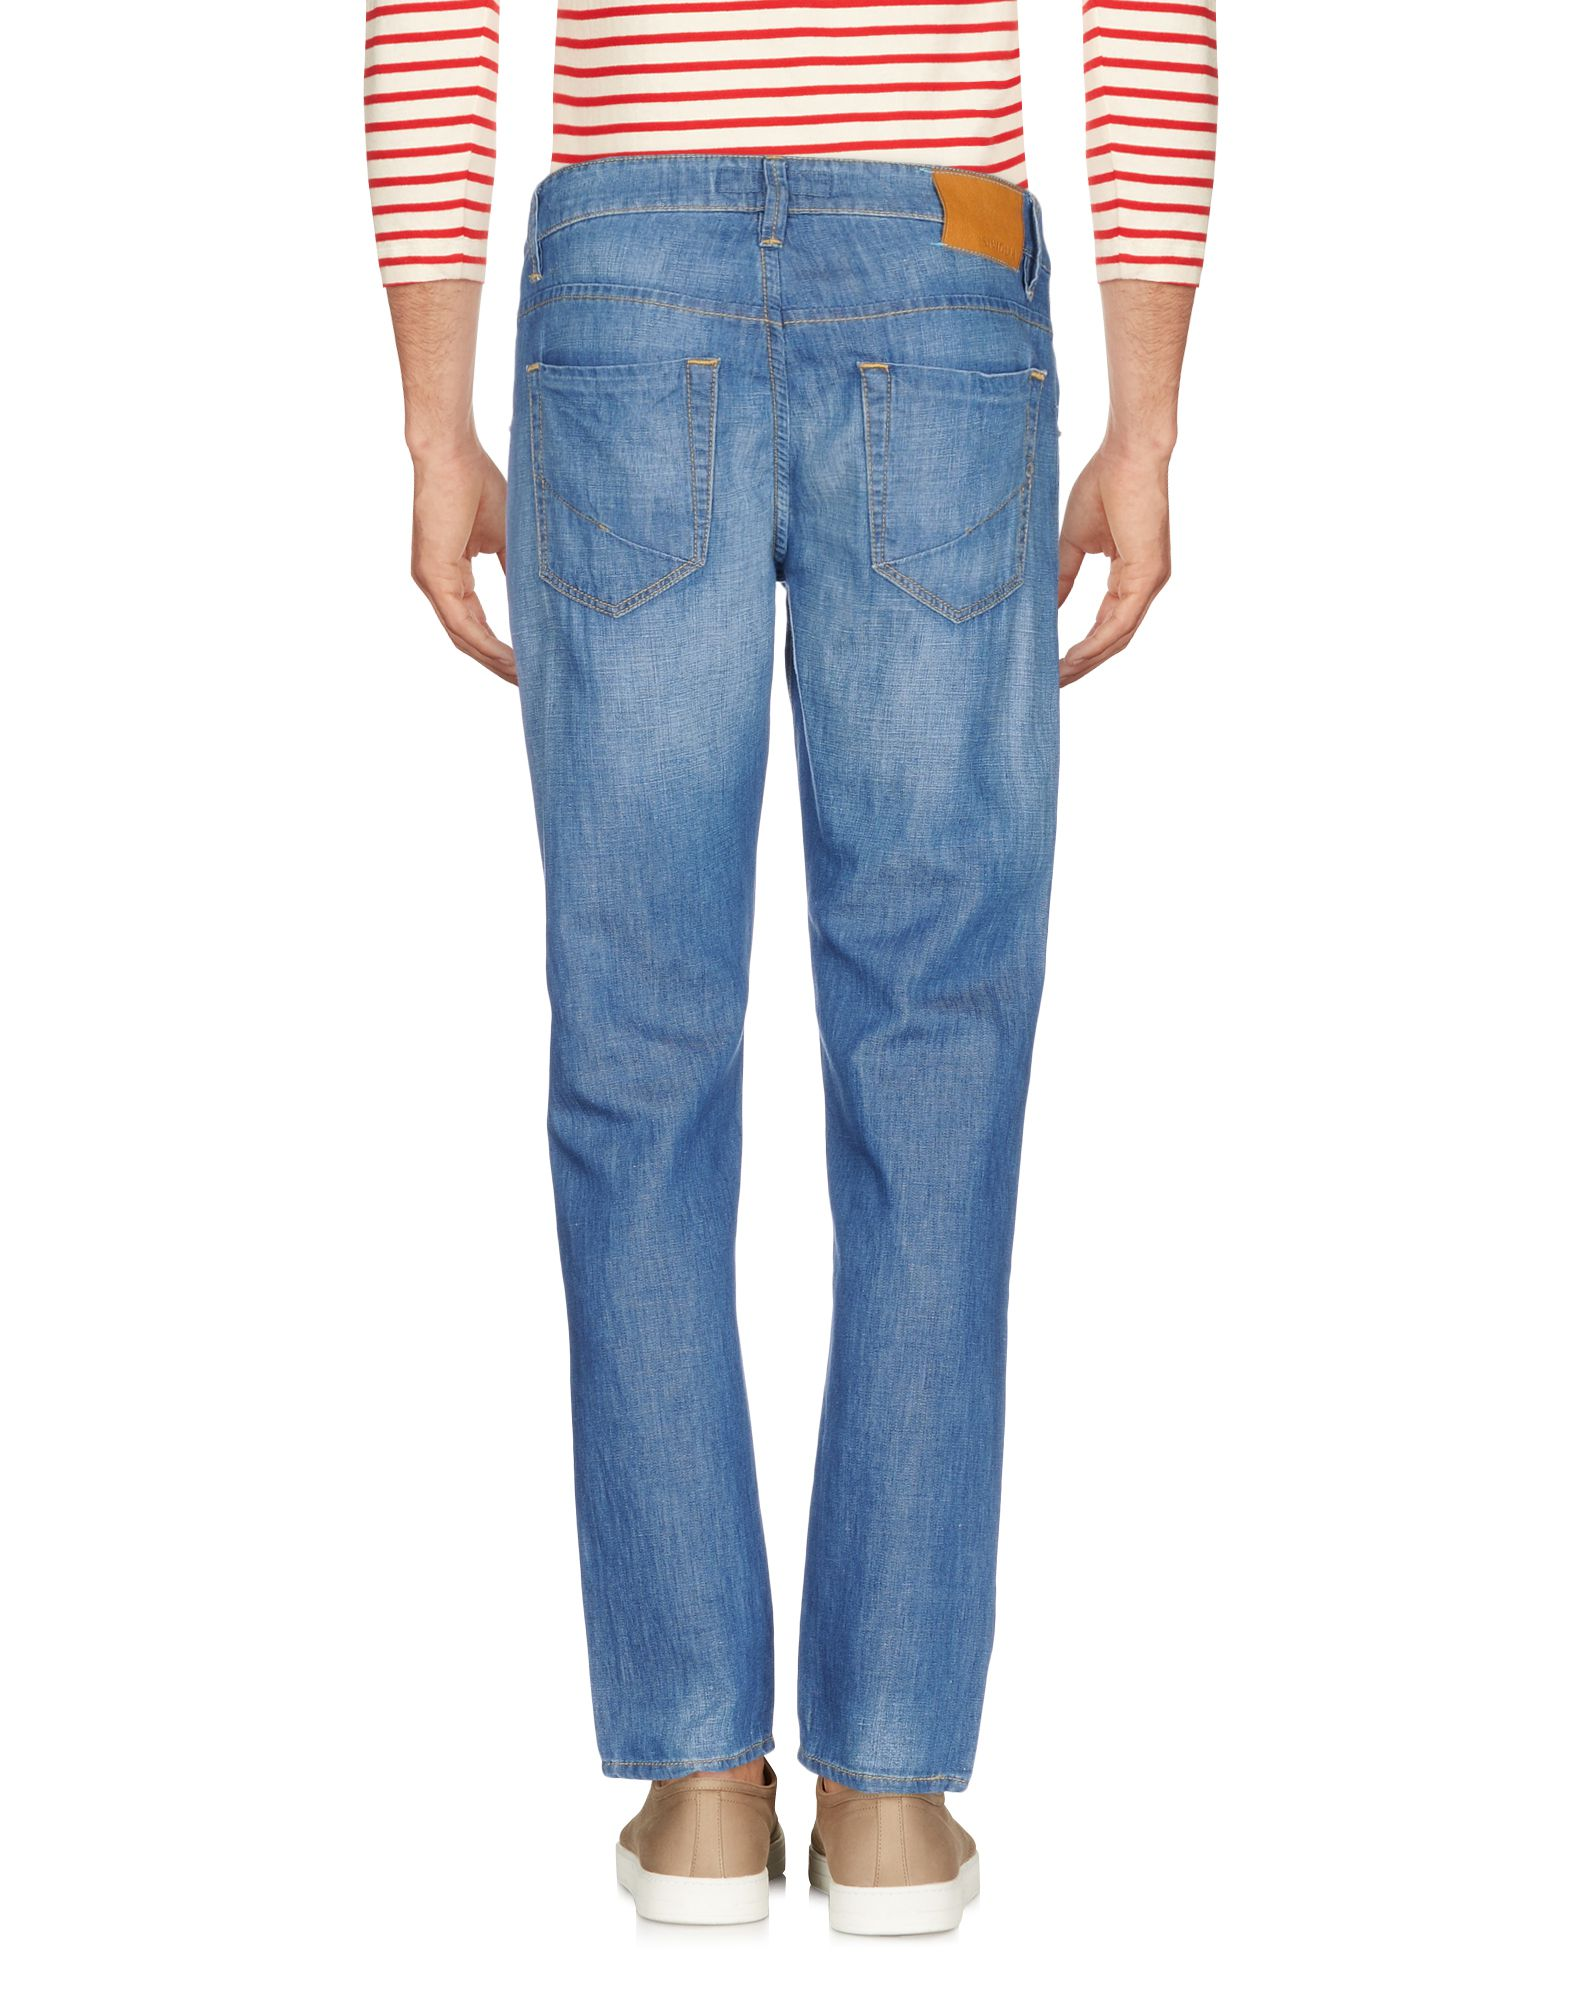 Pantaloni Jeans Siviglia Uomo 42650206XR - 42650206XR Uomo 692a3a